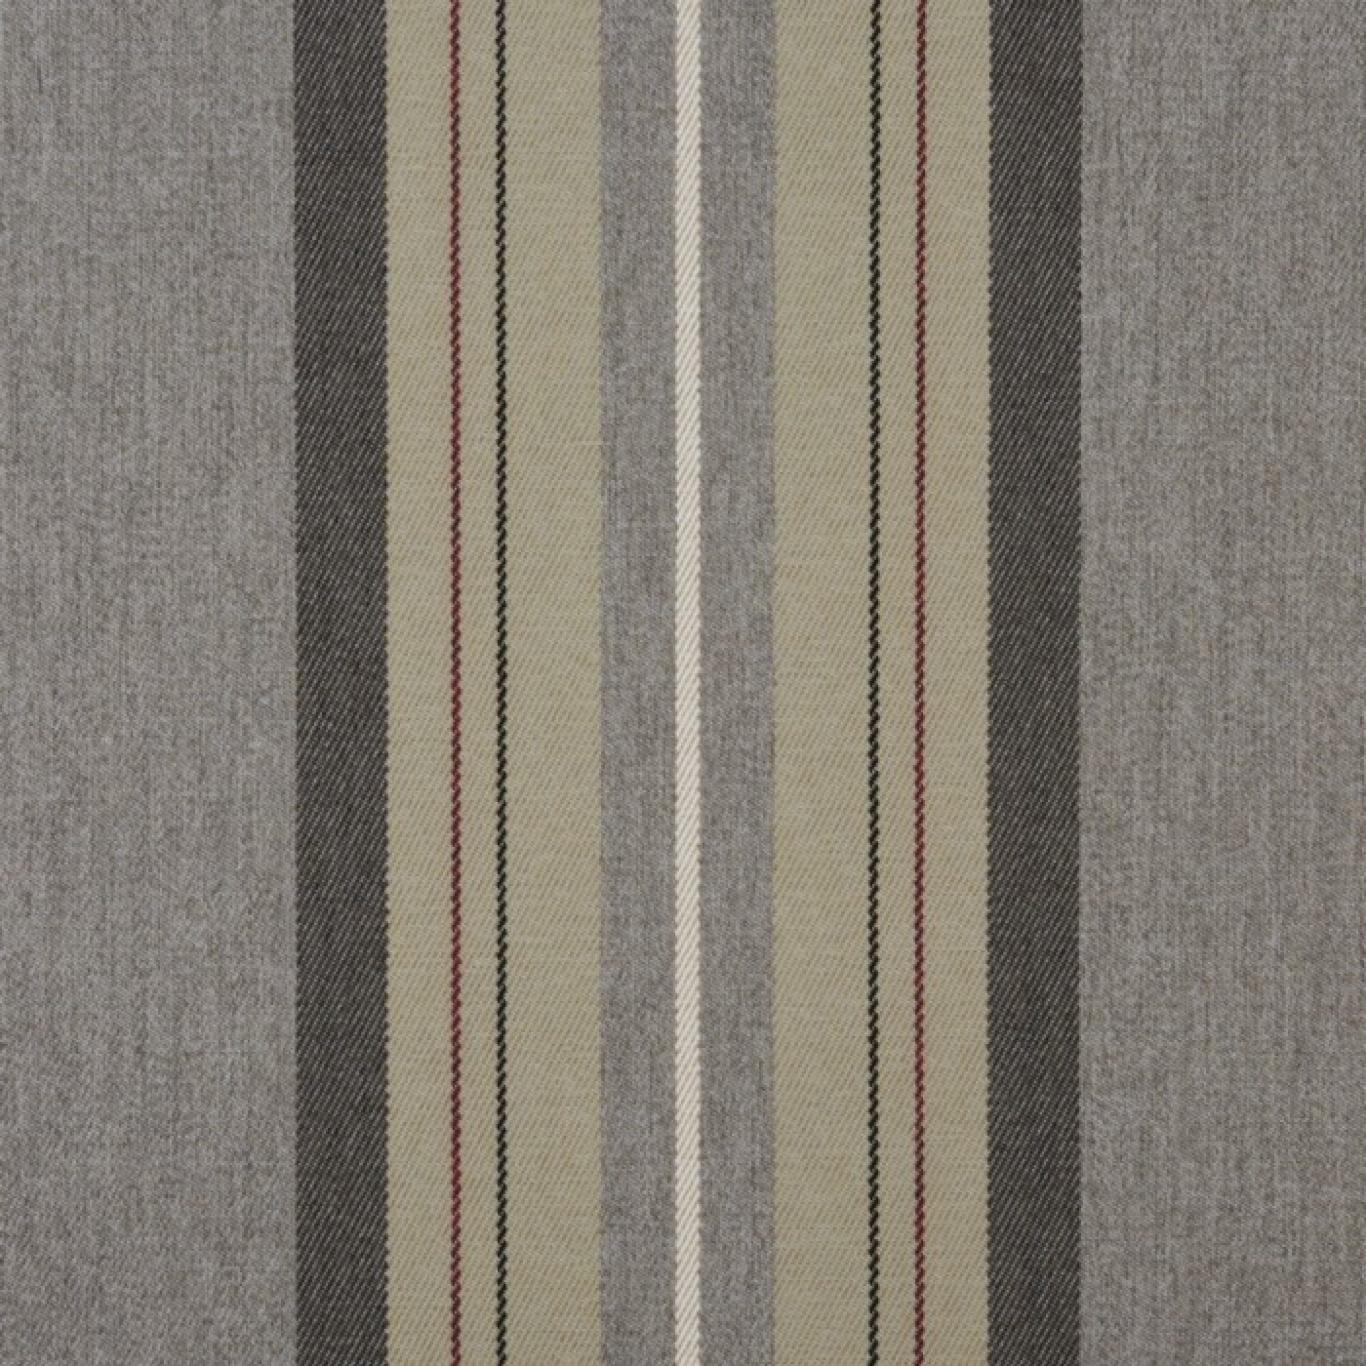 Image of Prestigious Glenfinnan Slate Fabric